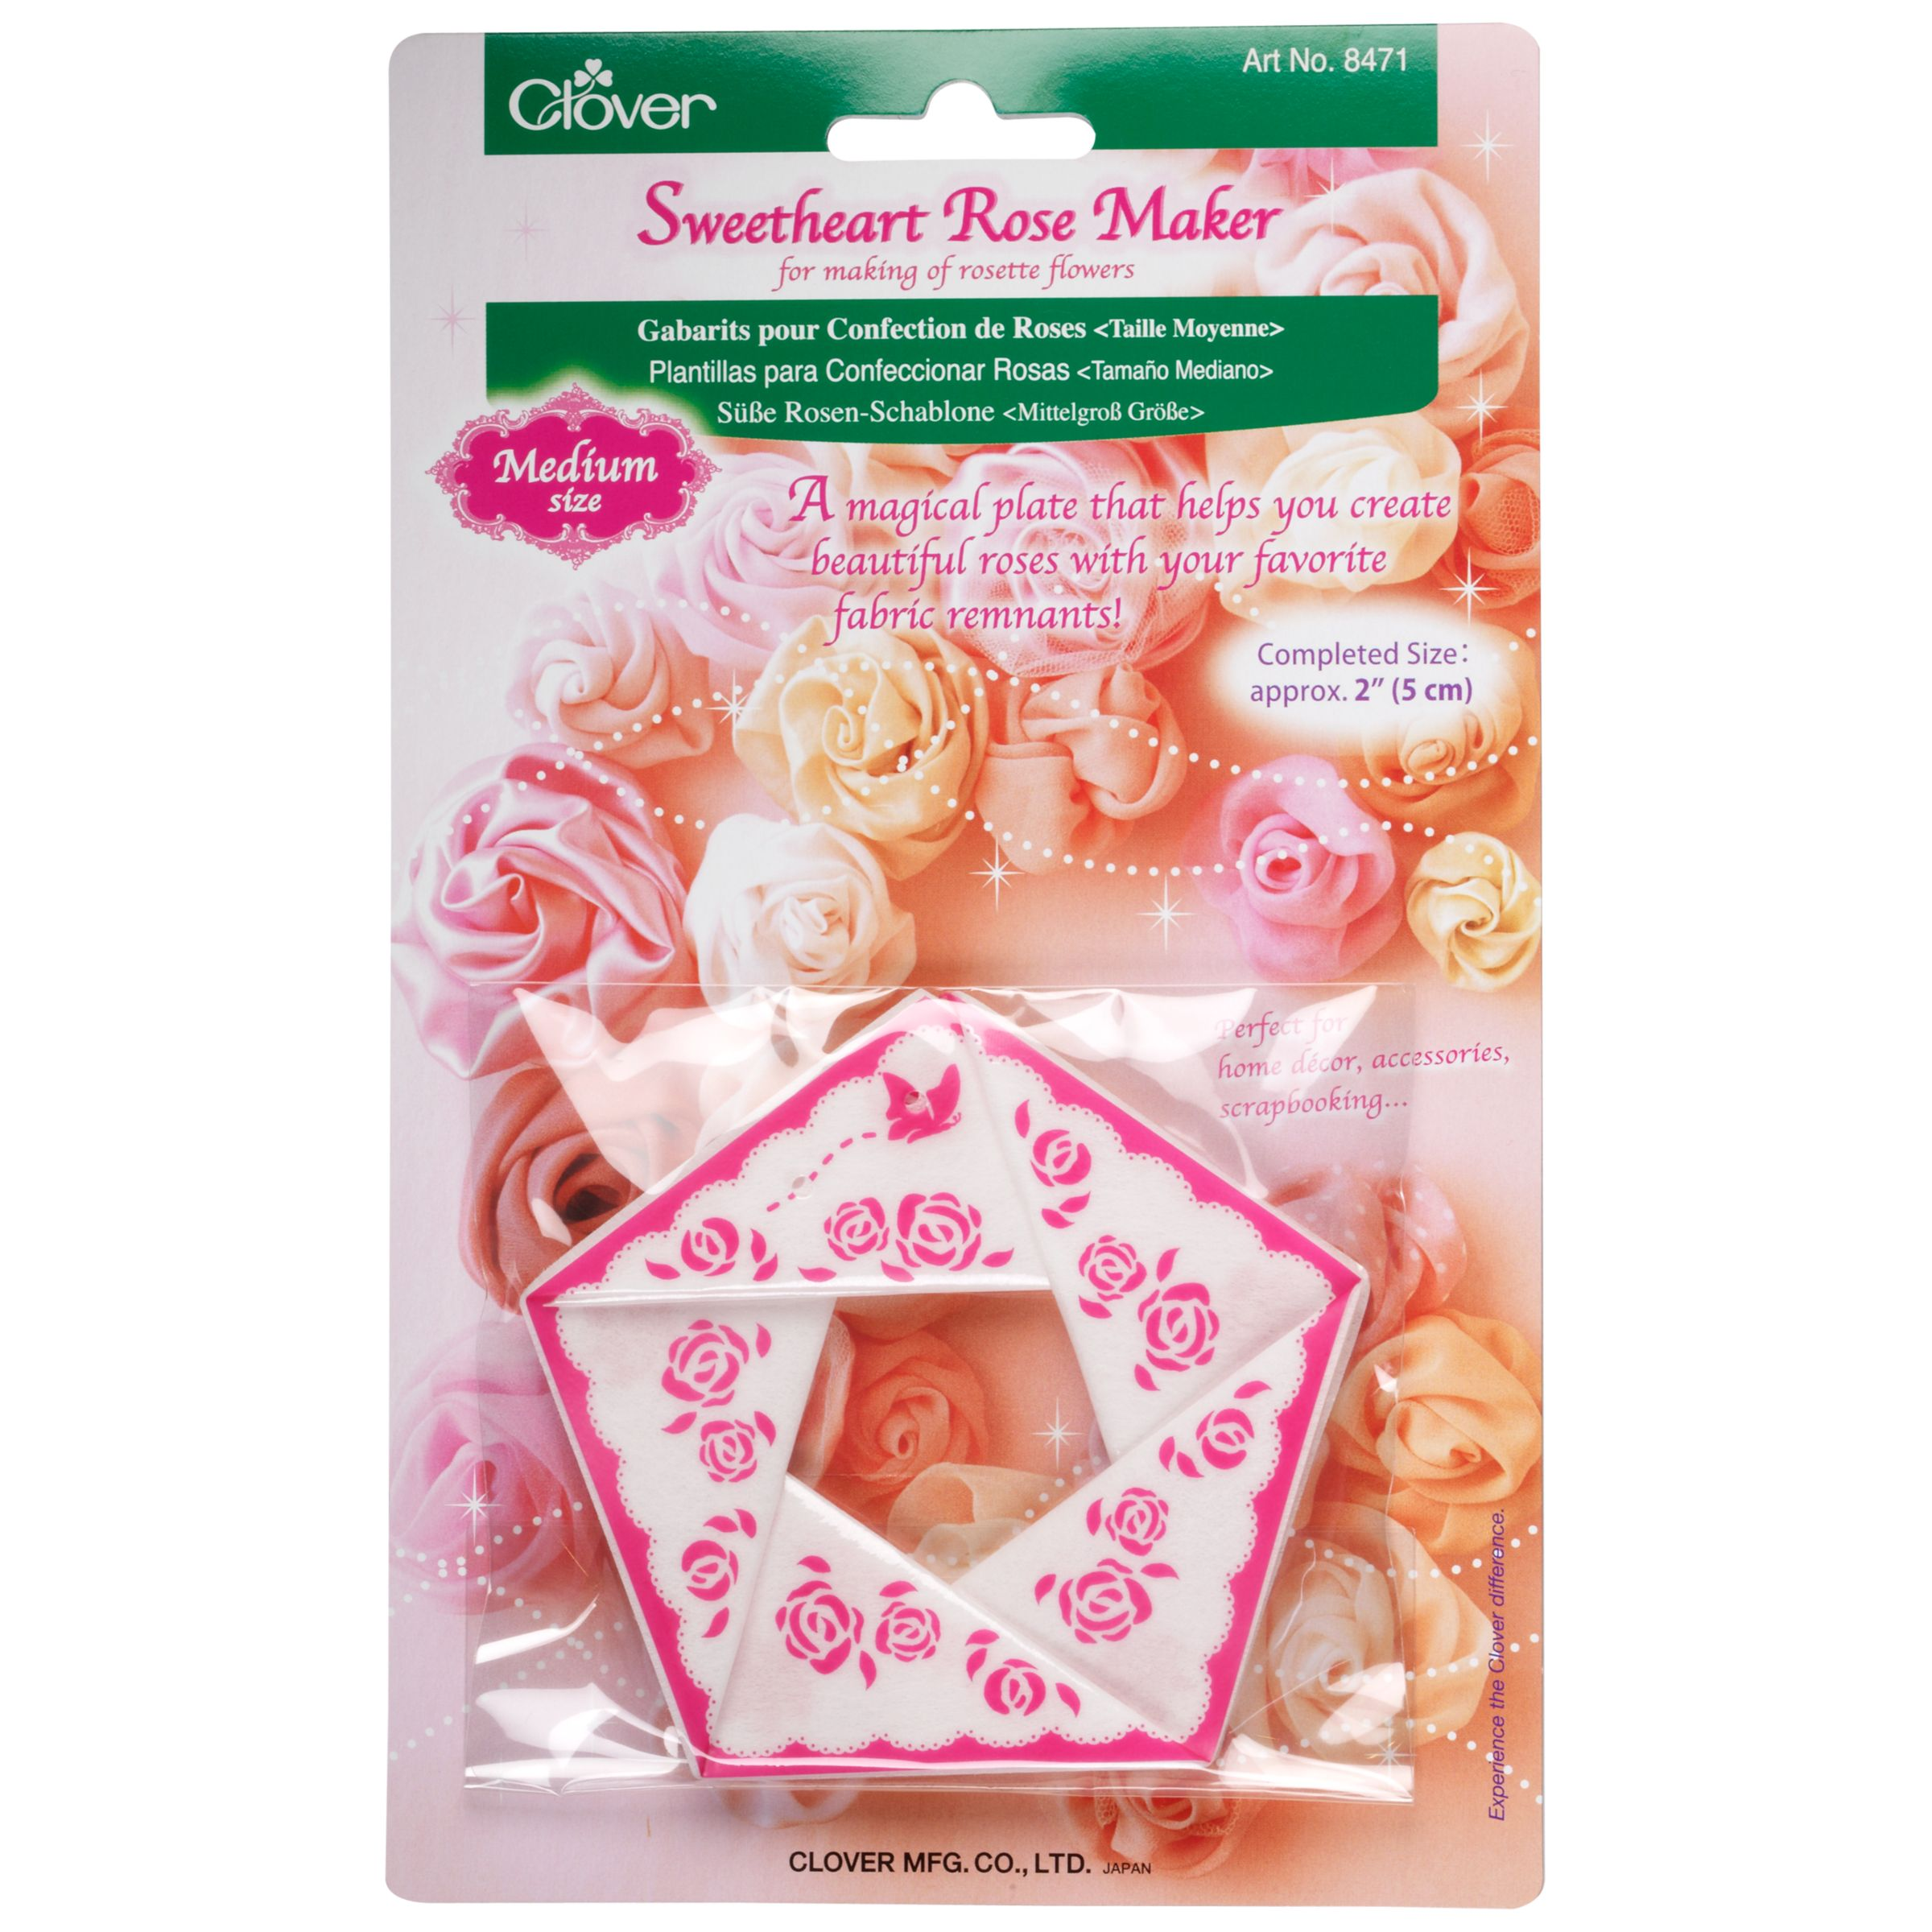 Cloverleaf Clover Sweetheart Rose Maker, Medium